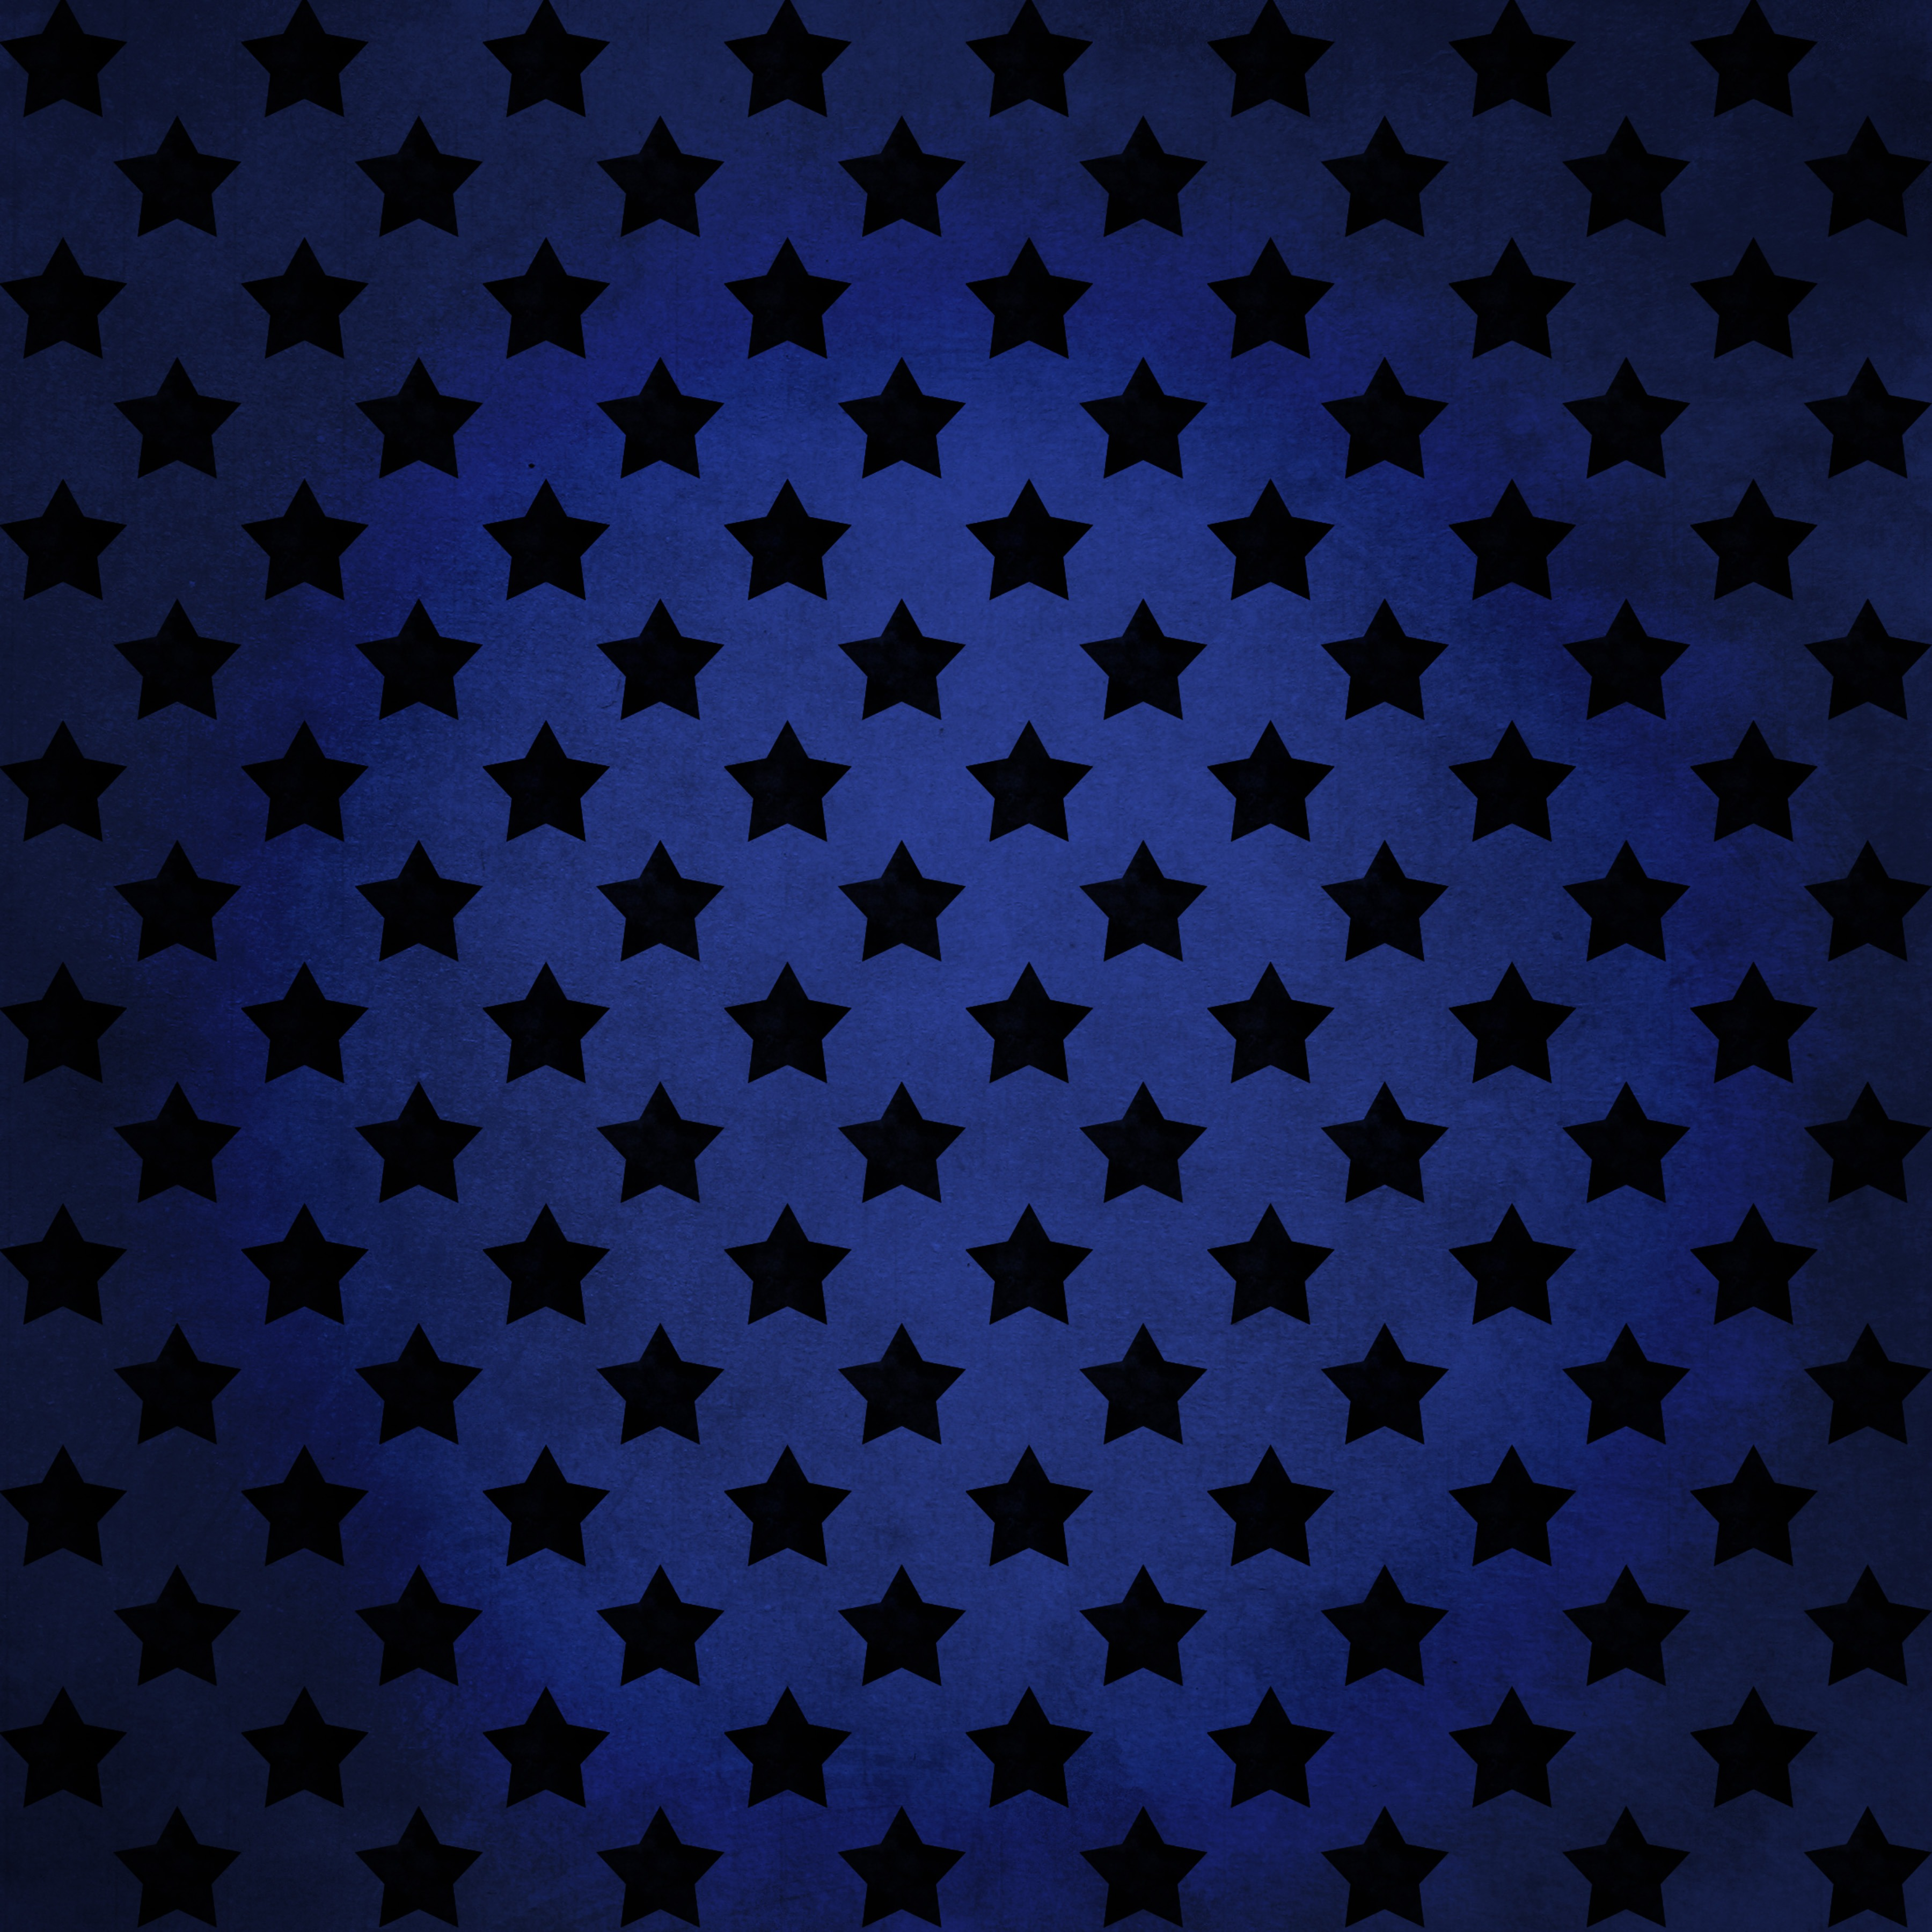 Vintage Star Pattern: Texture Pack